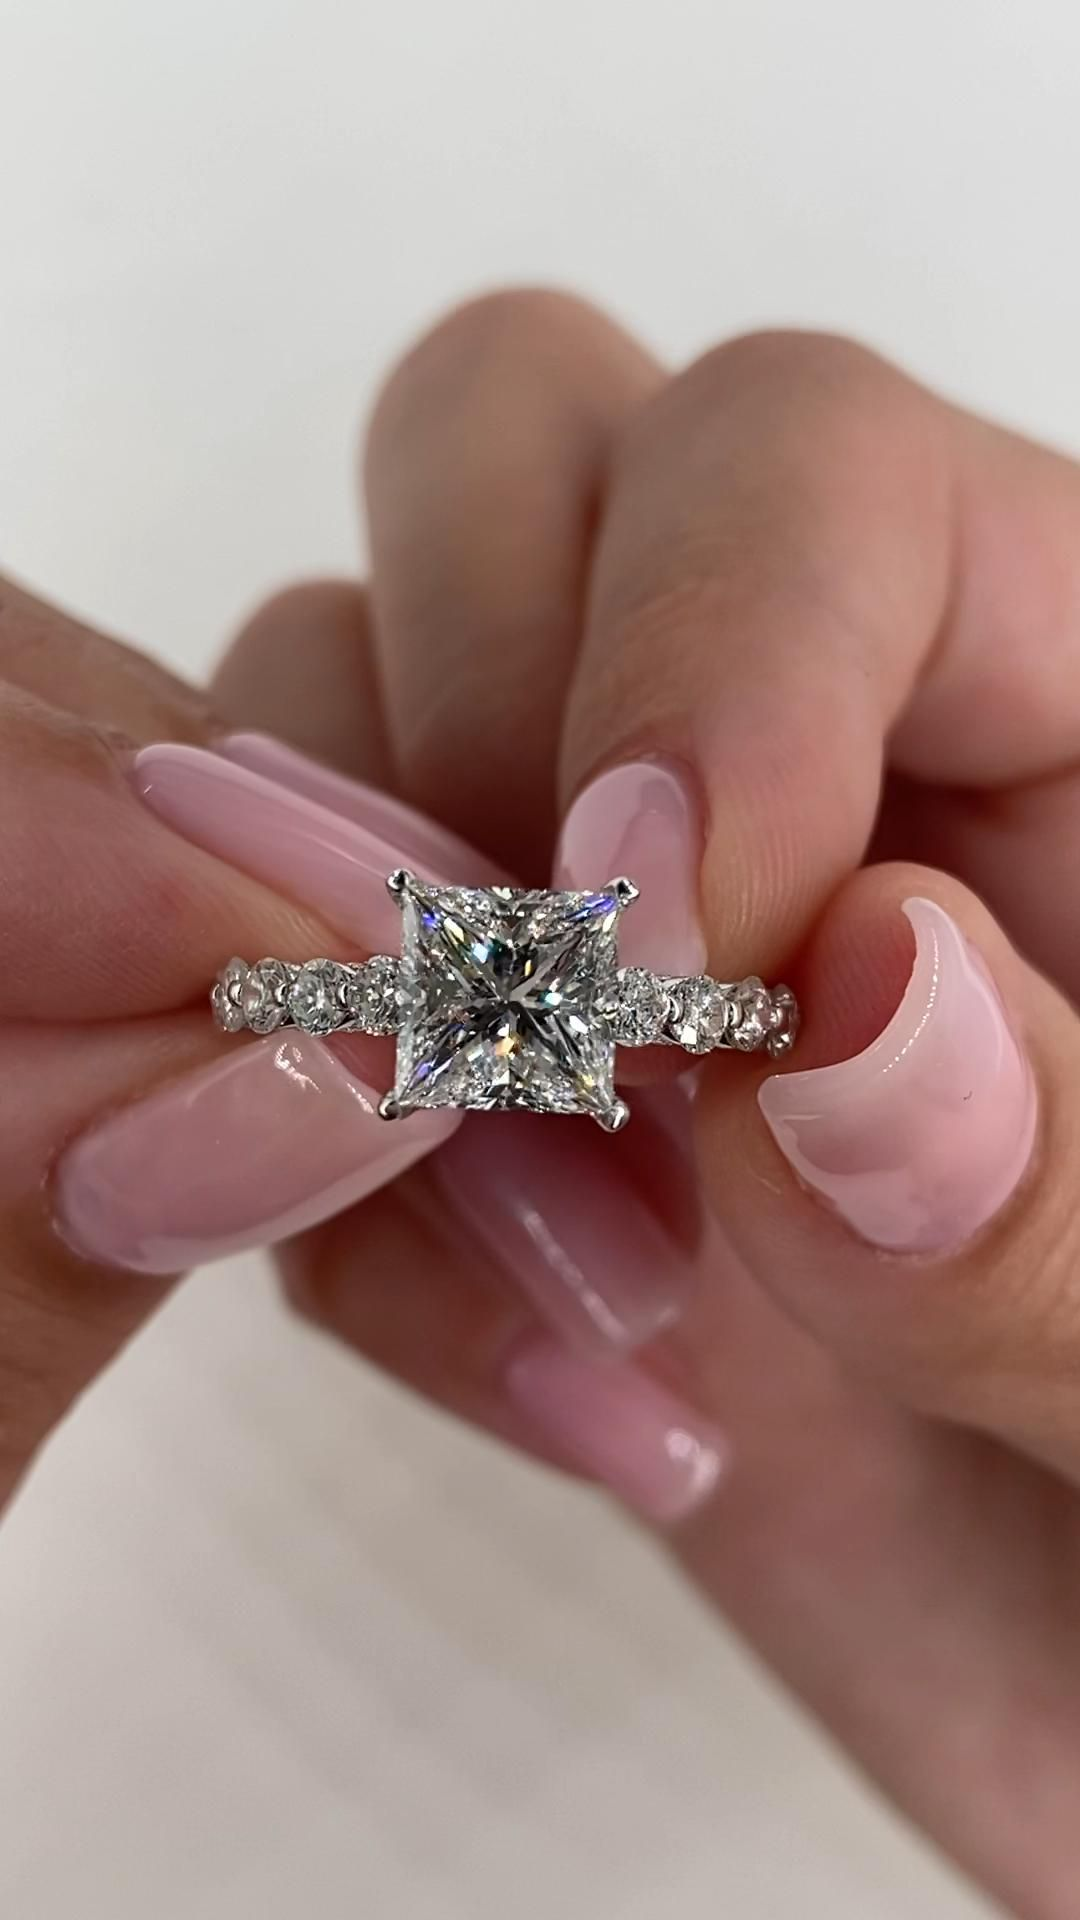 Princess Cut Diamond Engagement Ring 2.80 Carat Diamond Ring | Etsy